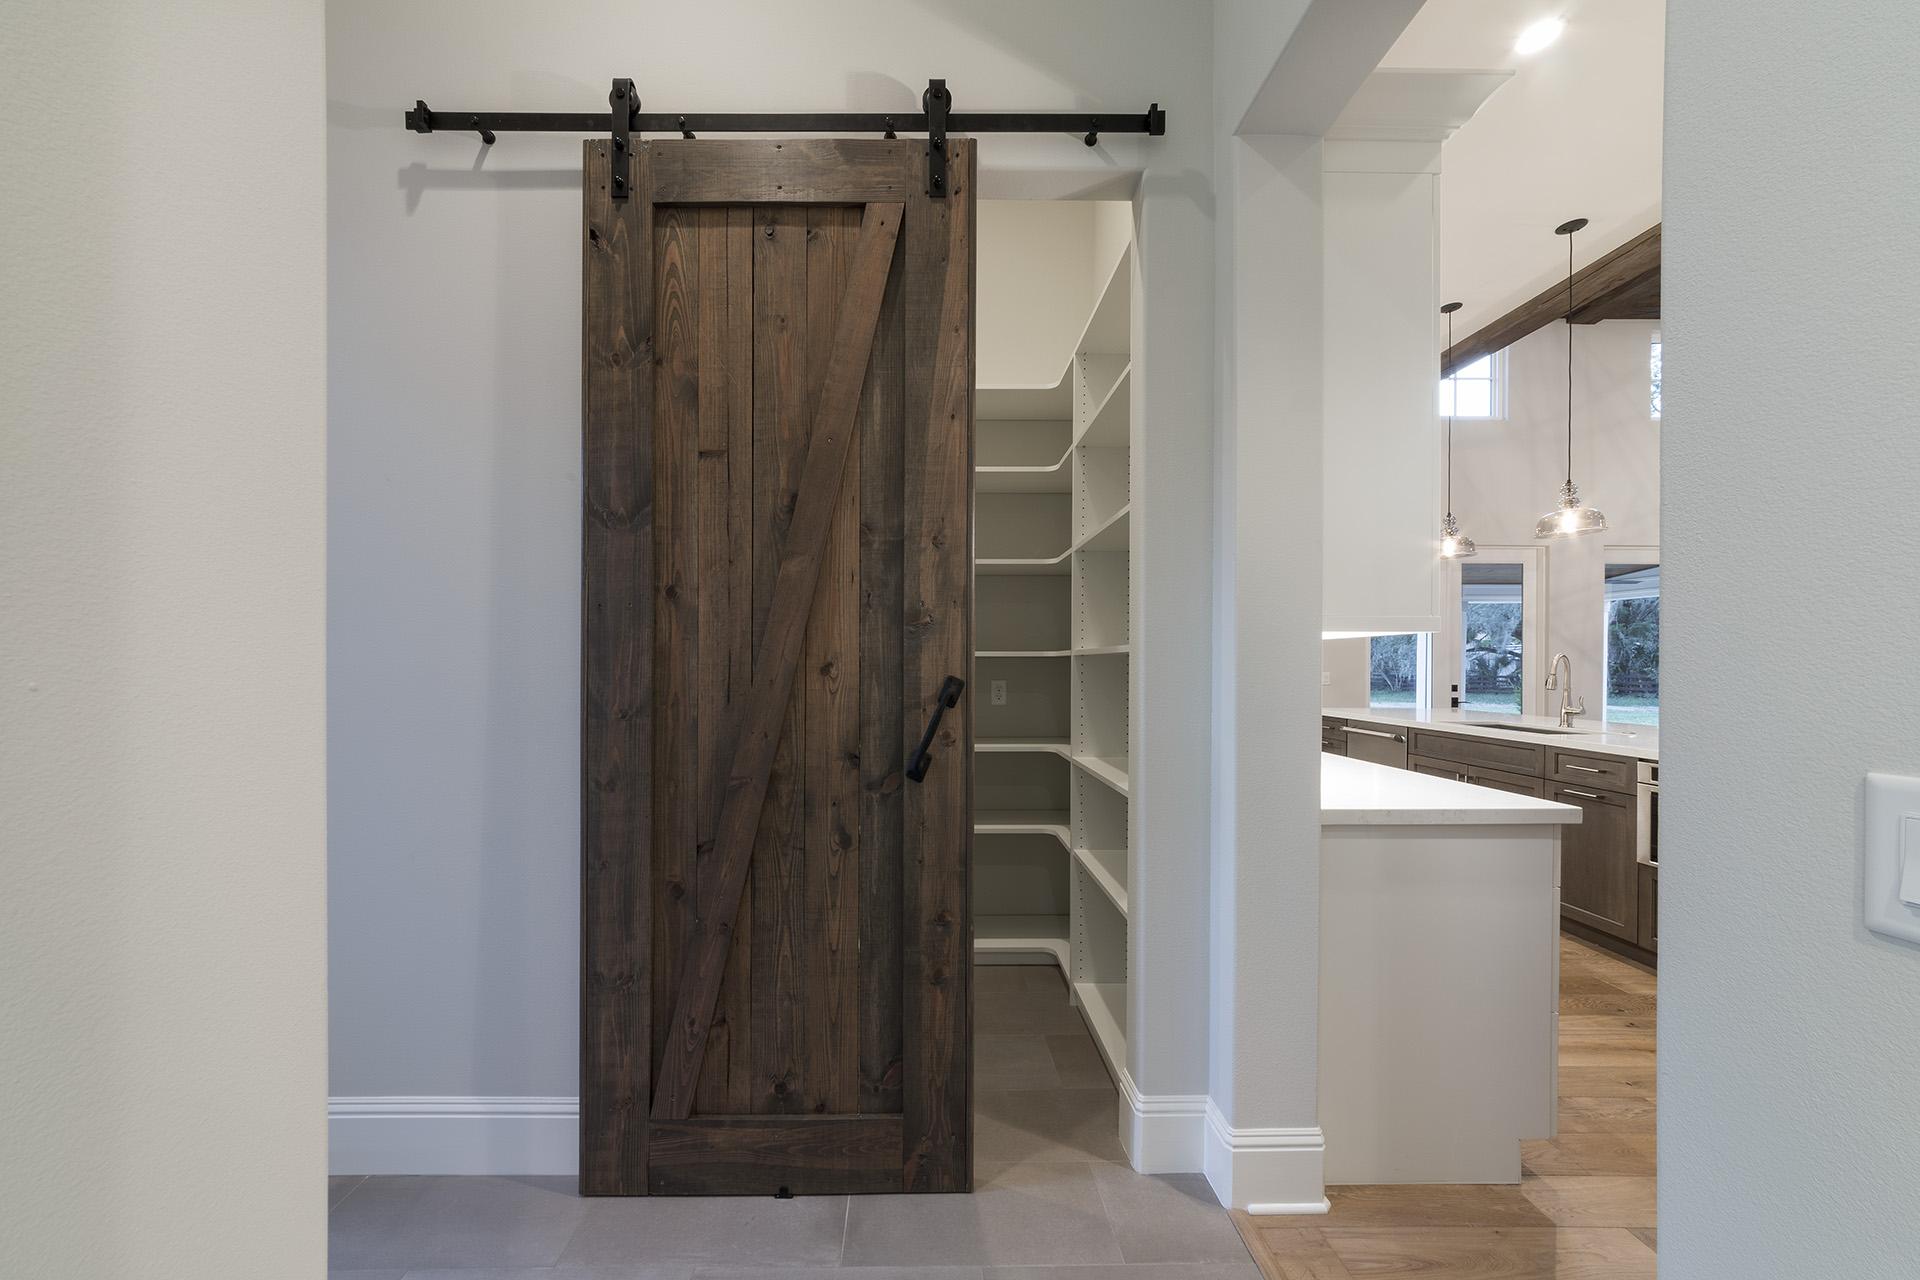 custom wooden sliding door in remodeled home by Einheit Homes